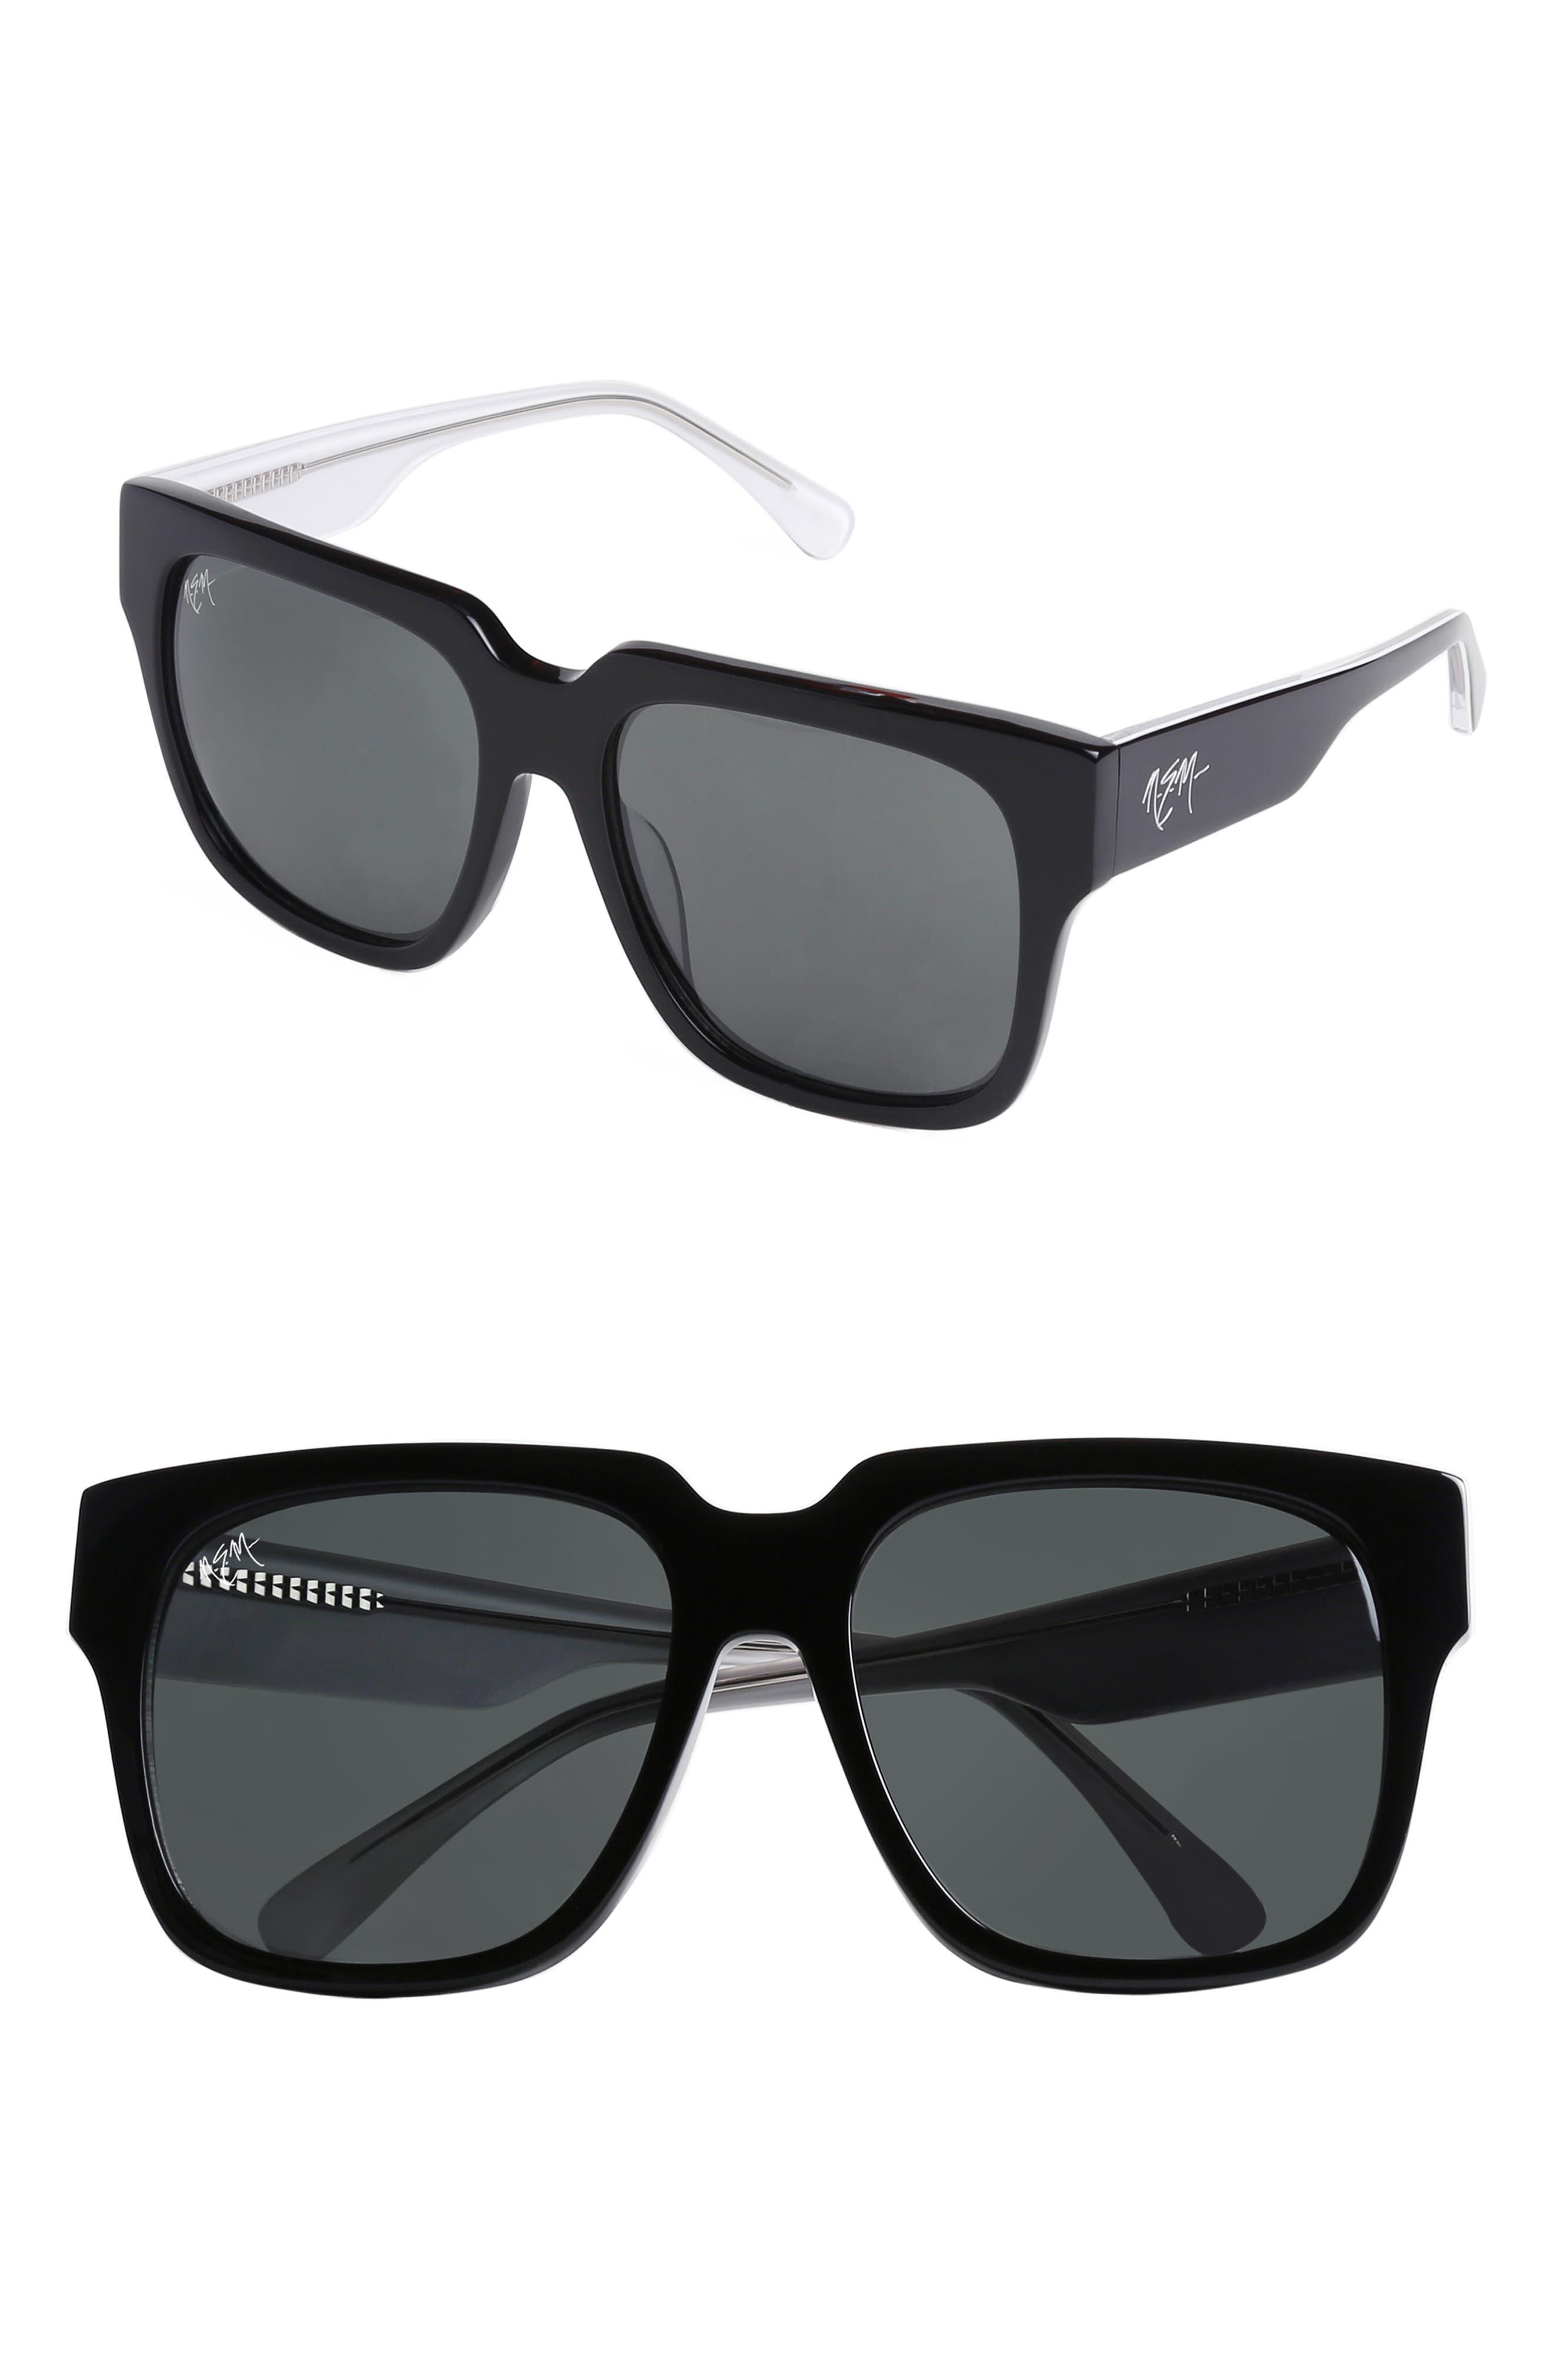 55mm Square Sunglasses,                         Main,                         color, GLOSSY BLACK